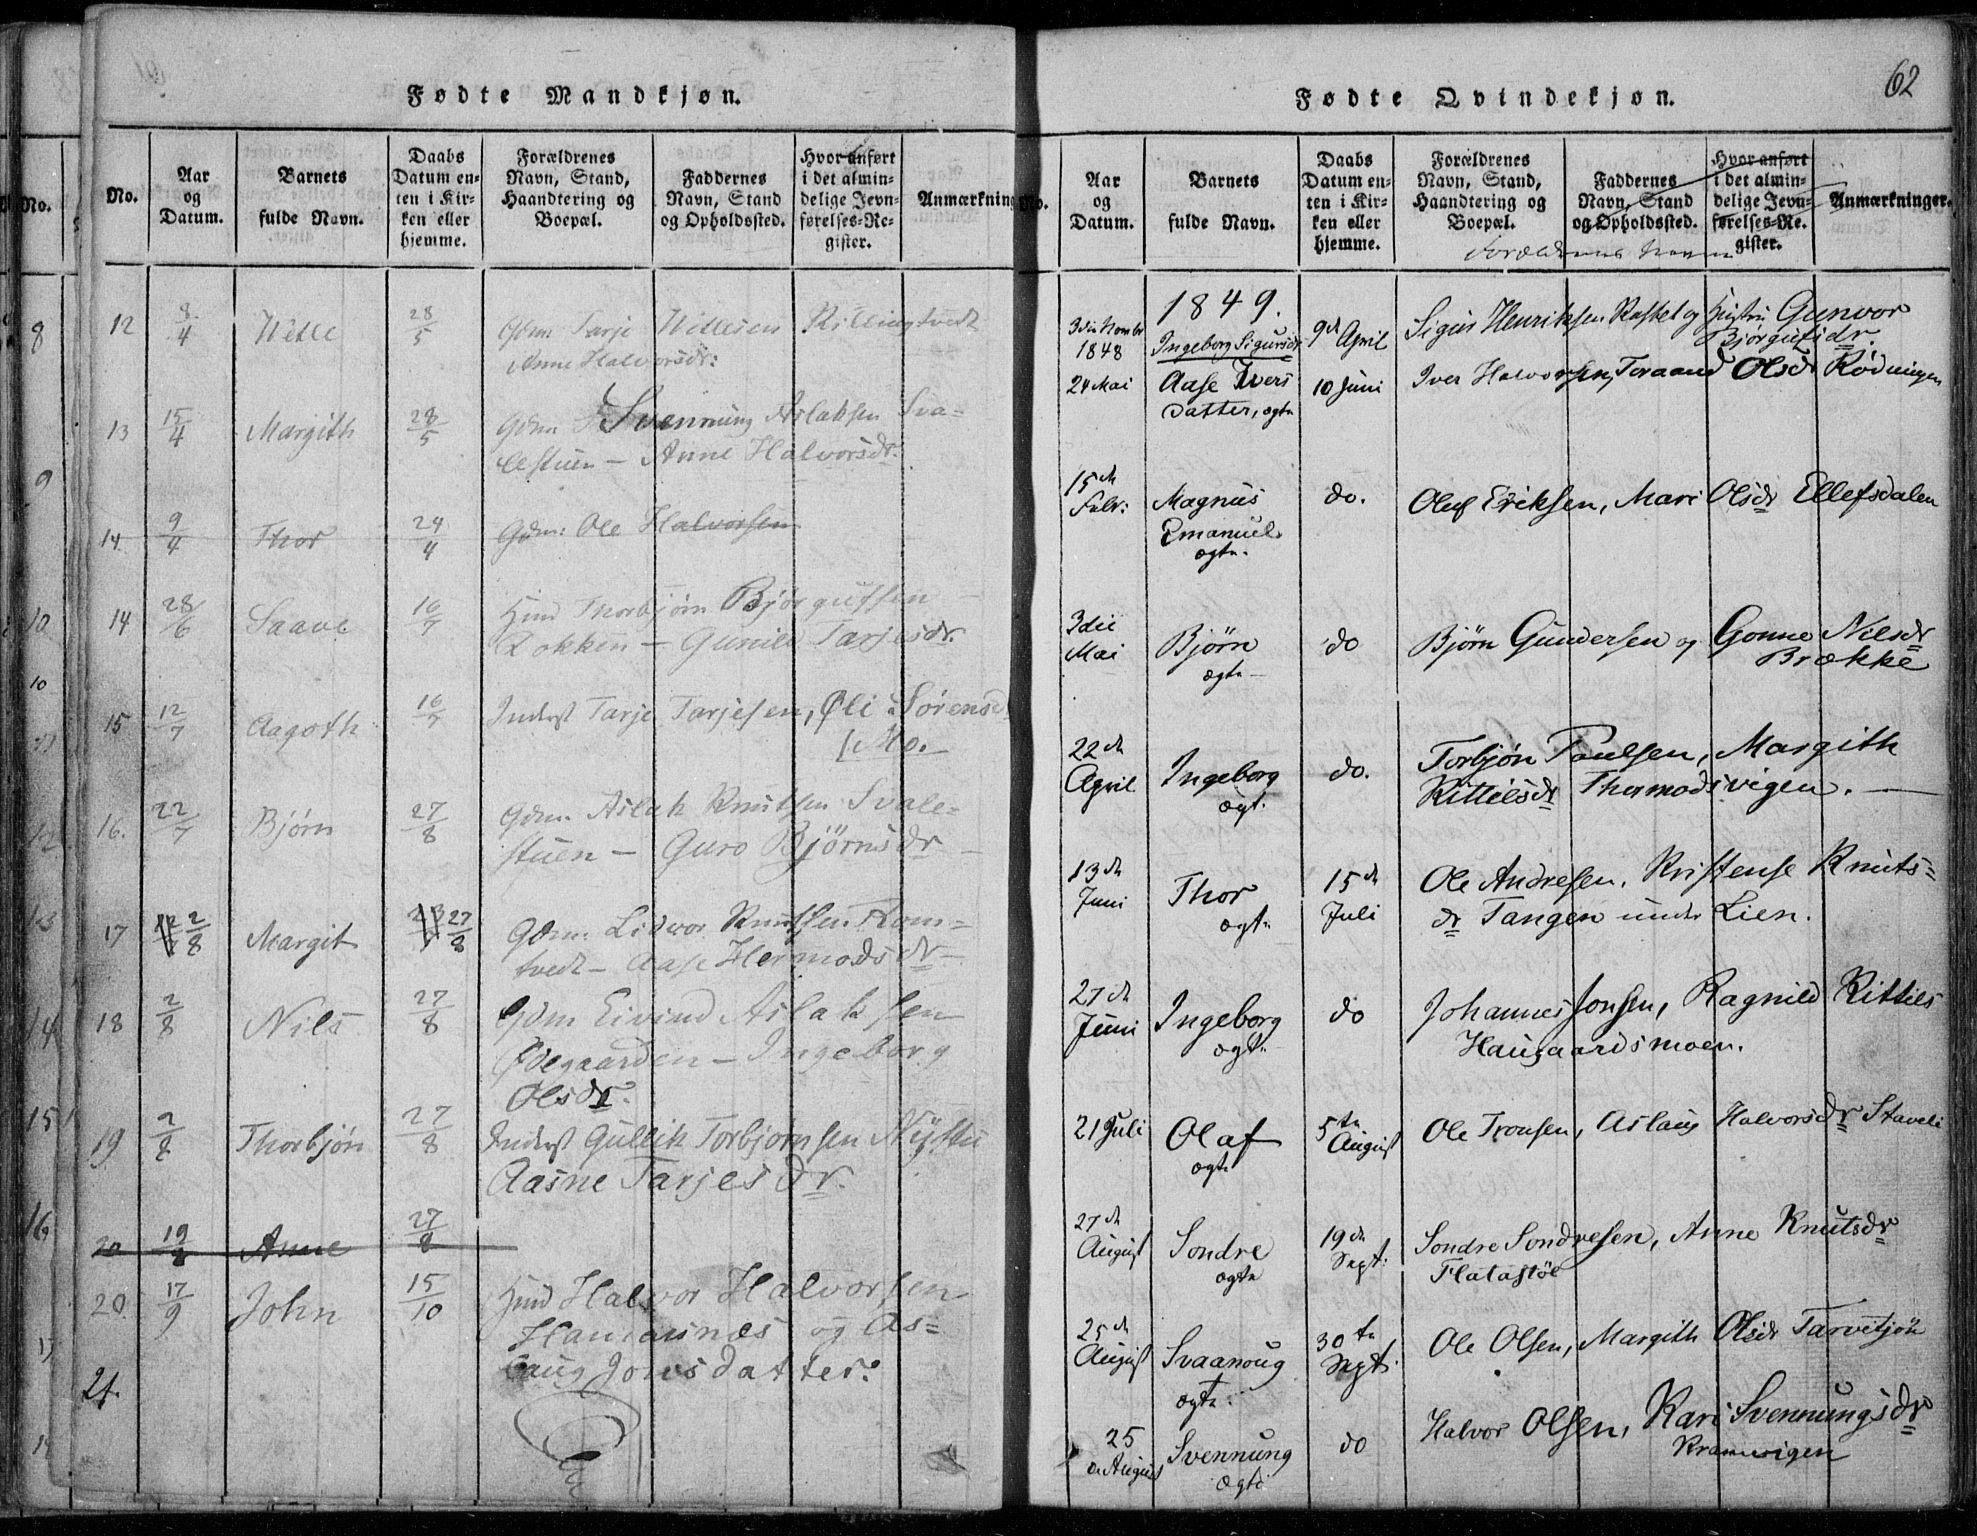 SAKO, Rauland kirkebøker, F/Fa/L0001: Ministerialbok nr. 1, 1814-1859, s. 62